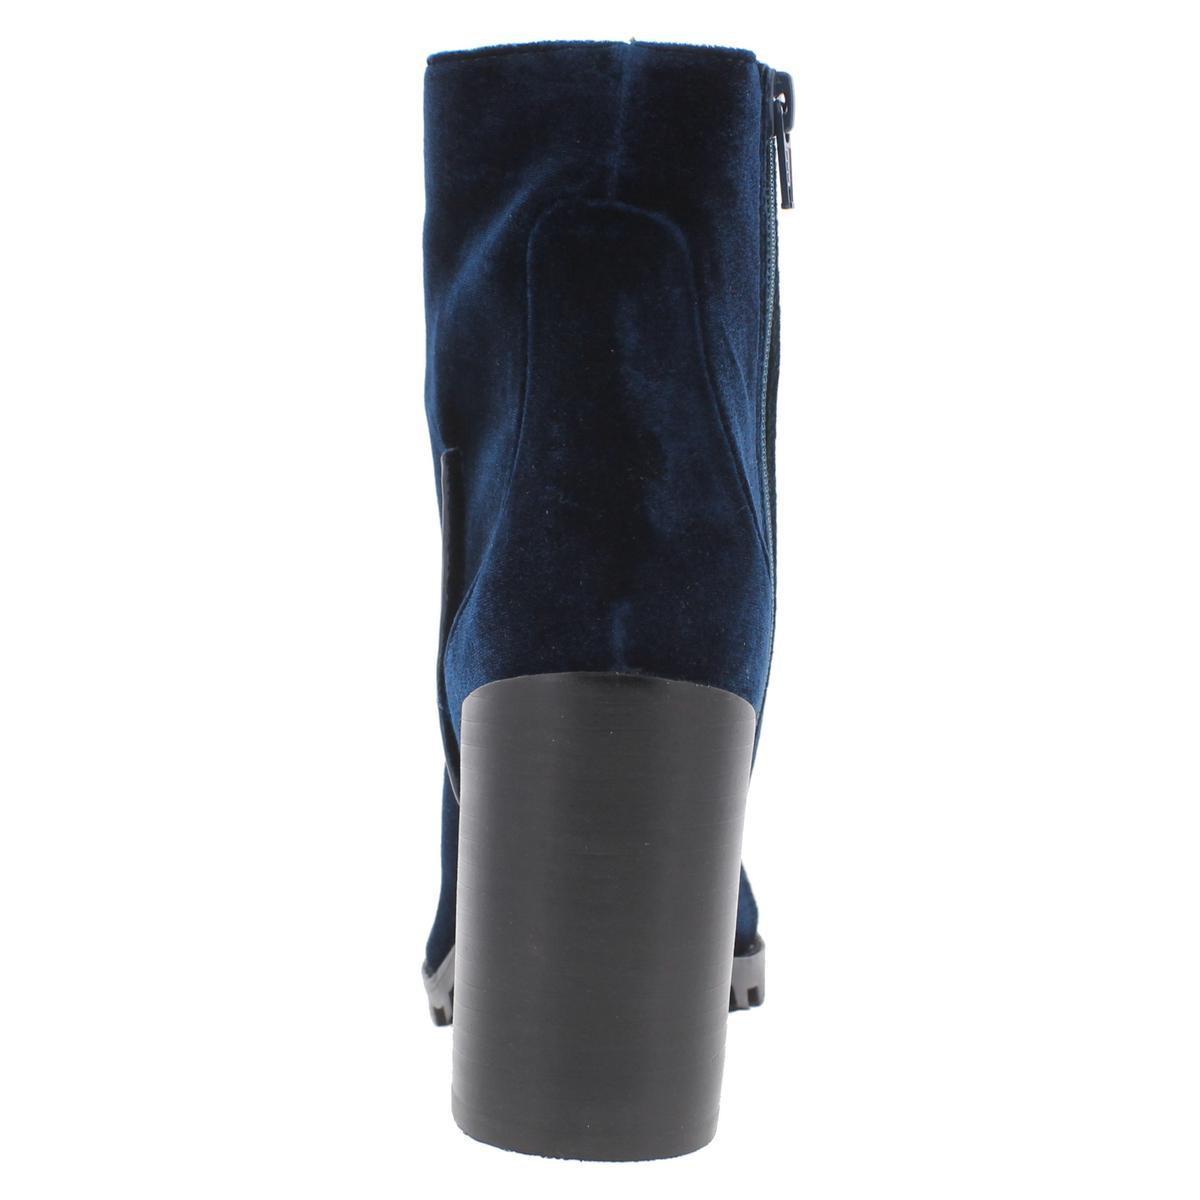 b7c8aa2c49c Lyst - Steve Madden Ambrose Velvet Lug Sole Casual Boots in Blue